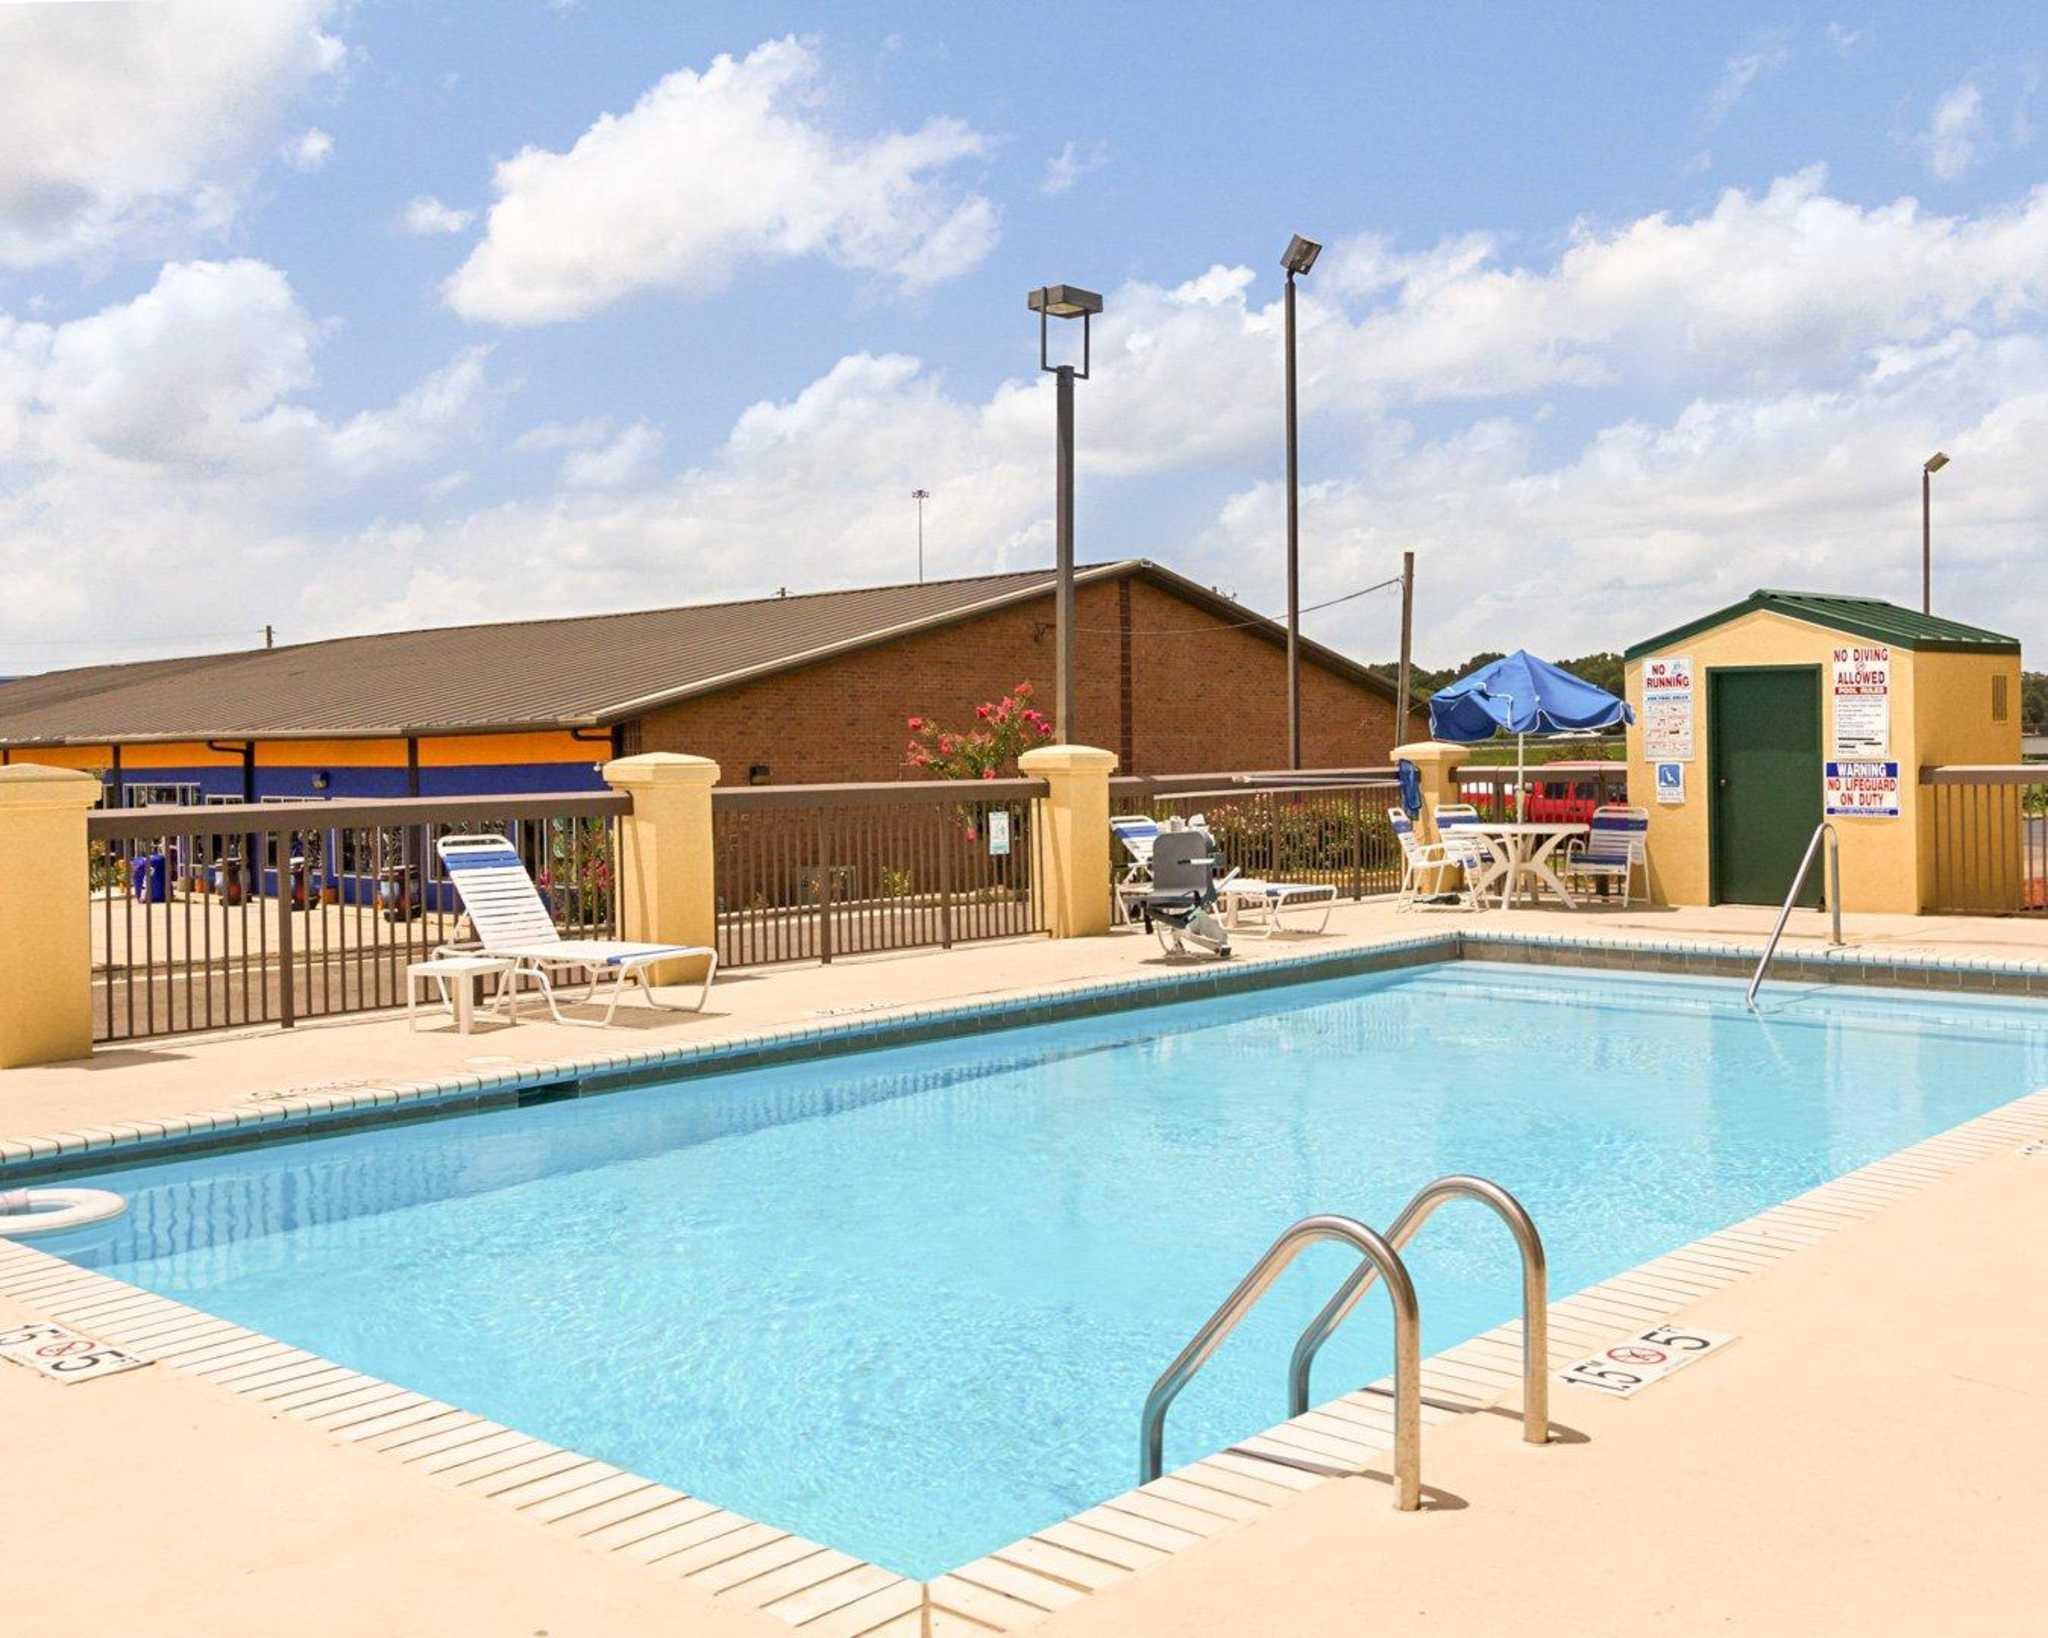 Quality Inn & Suites Southwest image 18